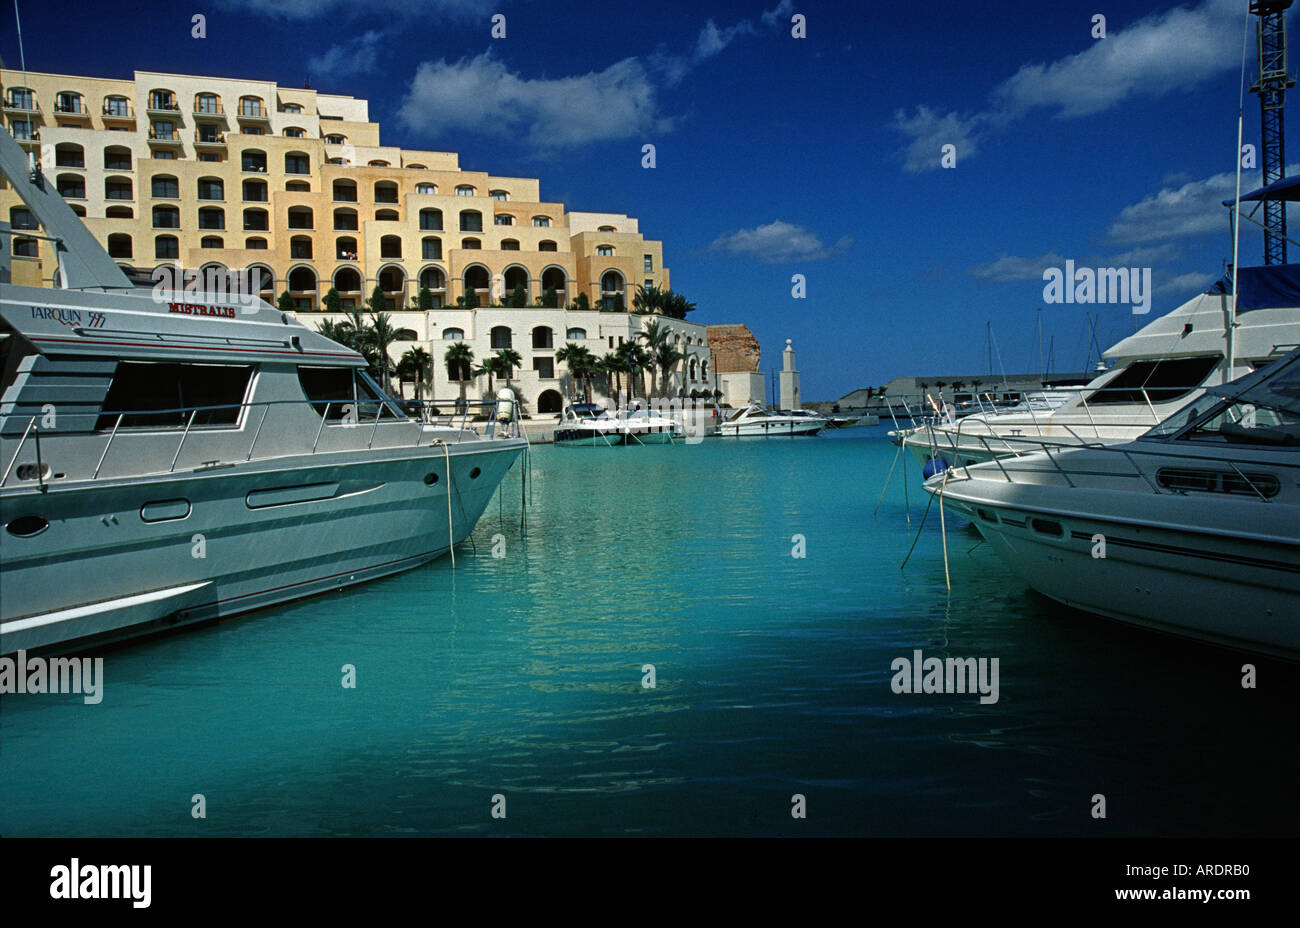 Portomaso Yacht Marina MALTA The Hilton hotel forms part of the waterfront complex - Stock Image